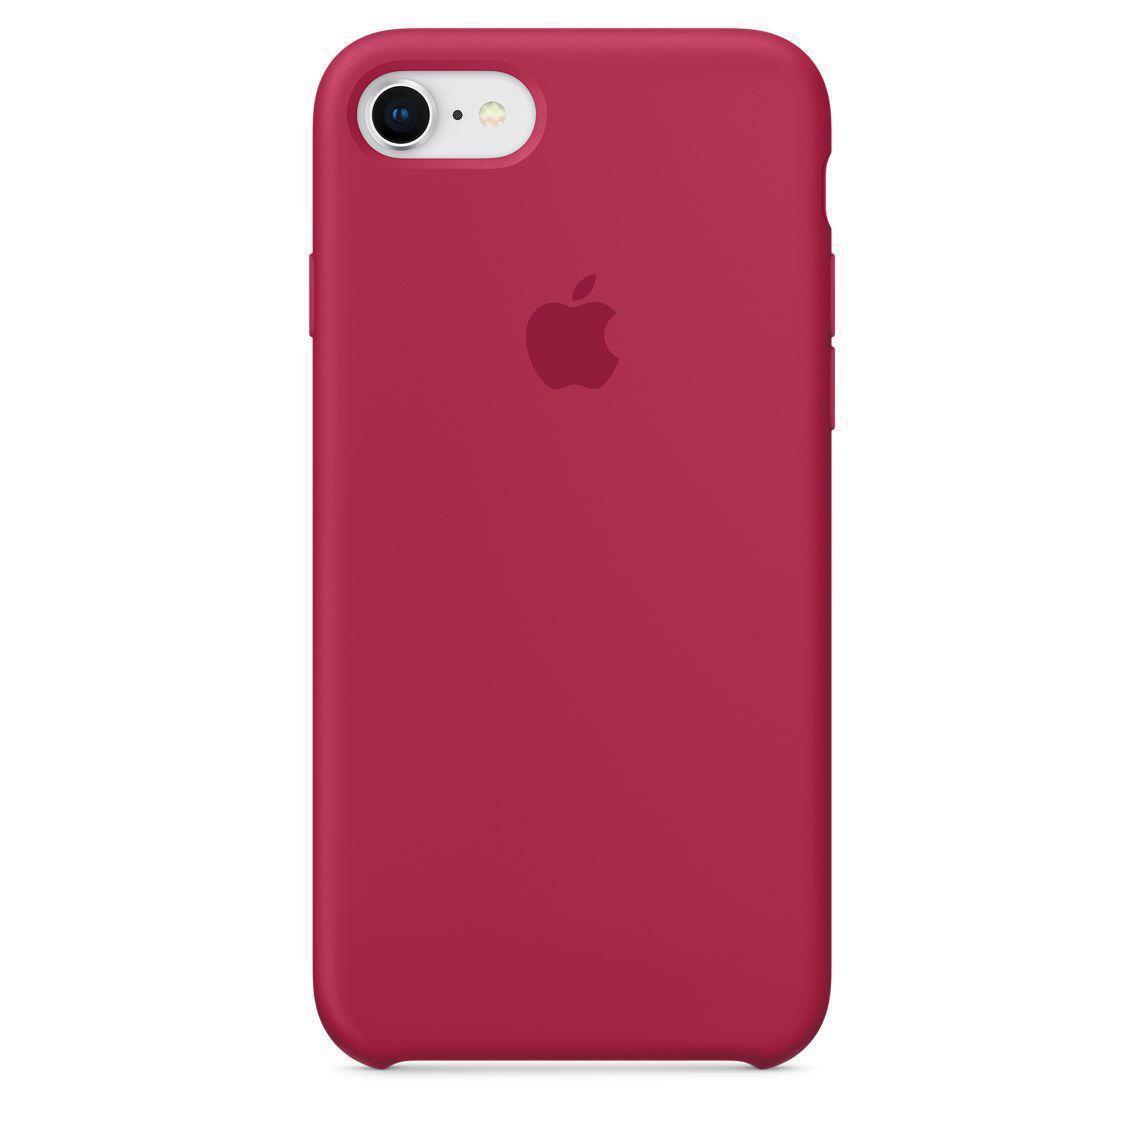 ЧЕХОЛ НАКЛАДКА SILICONE CASE ДЛЯ IPHONE 6/6S - ROSE RED